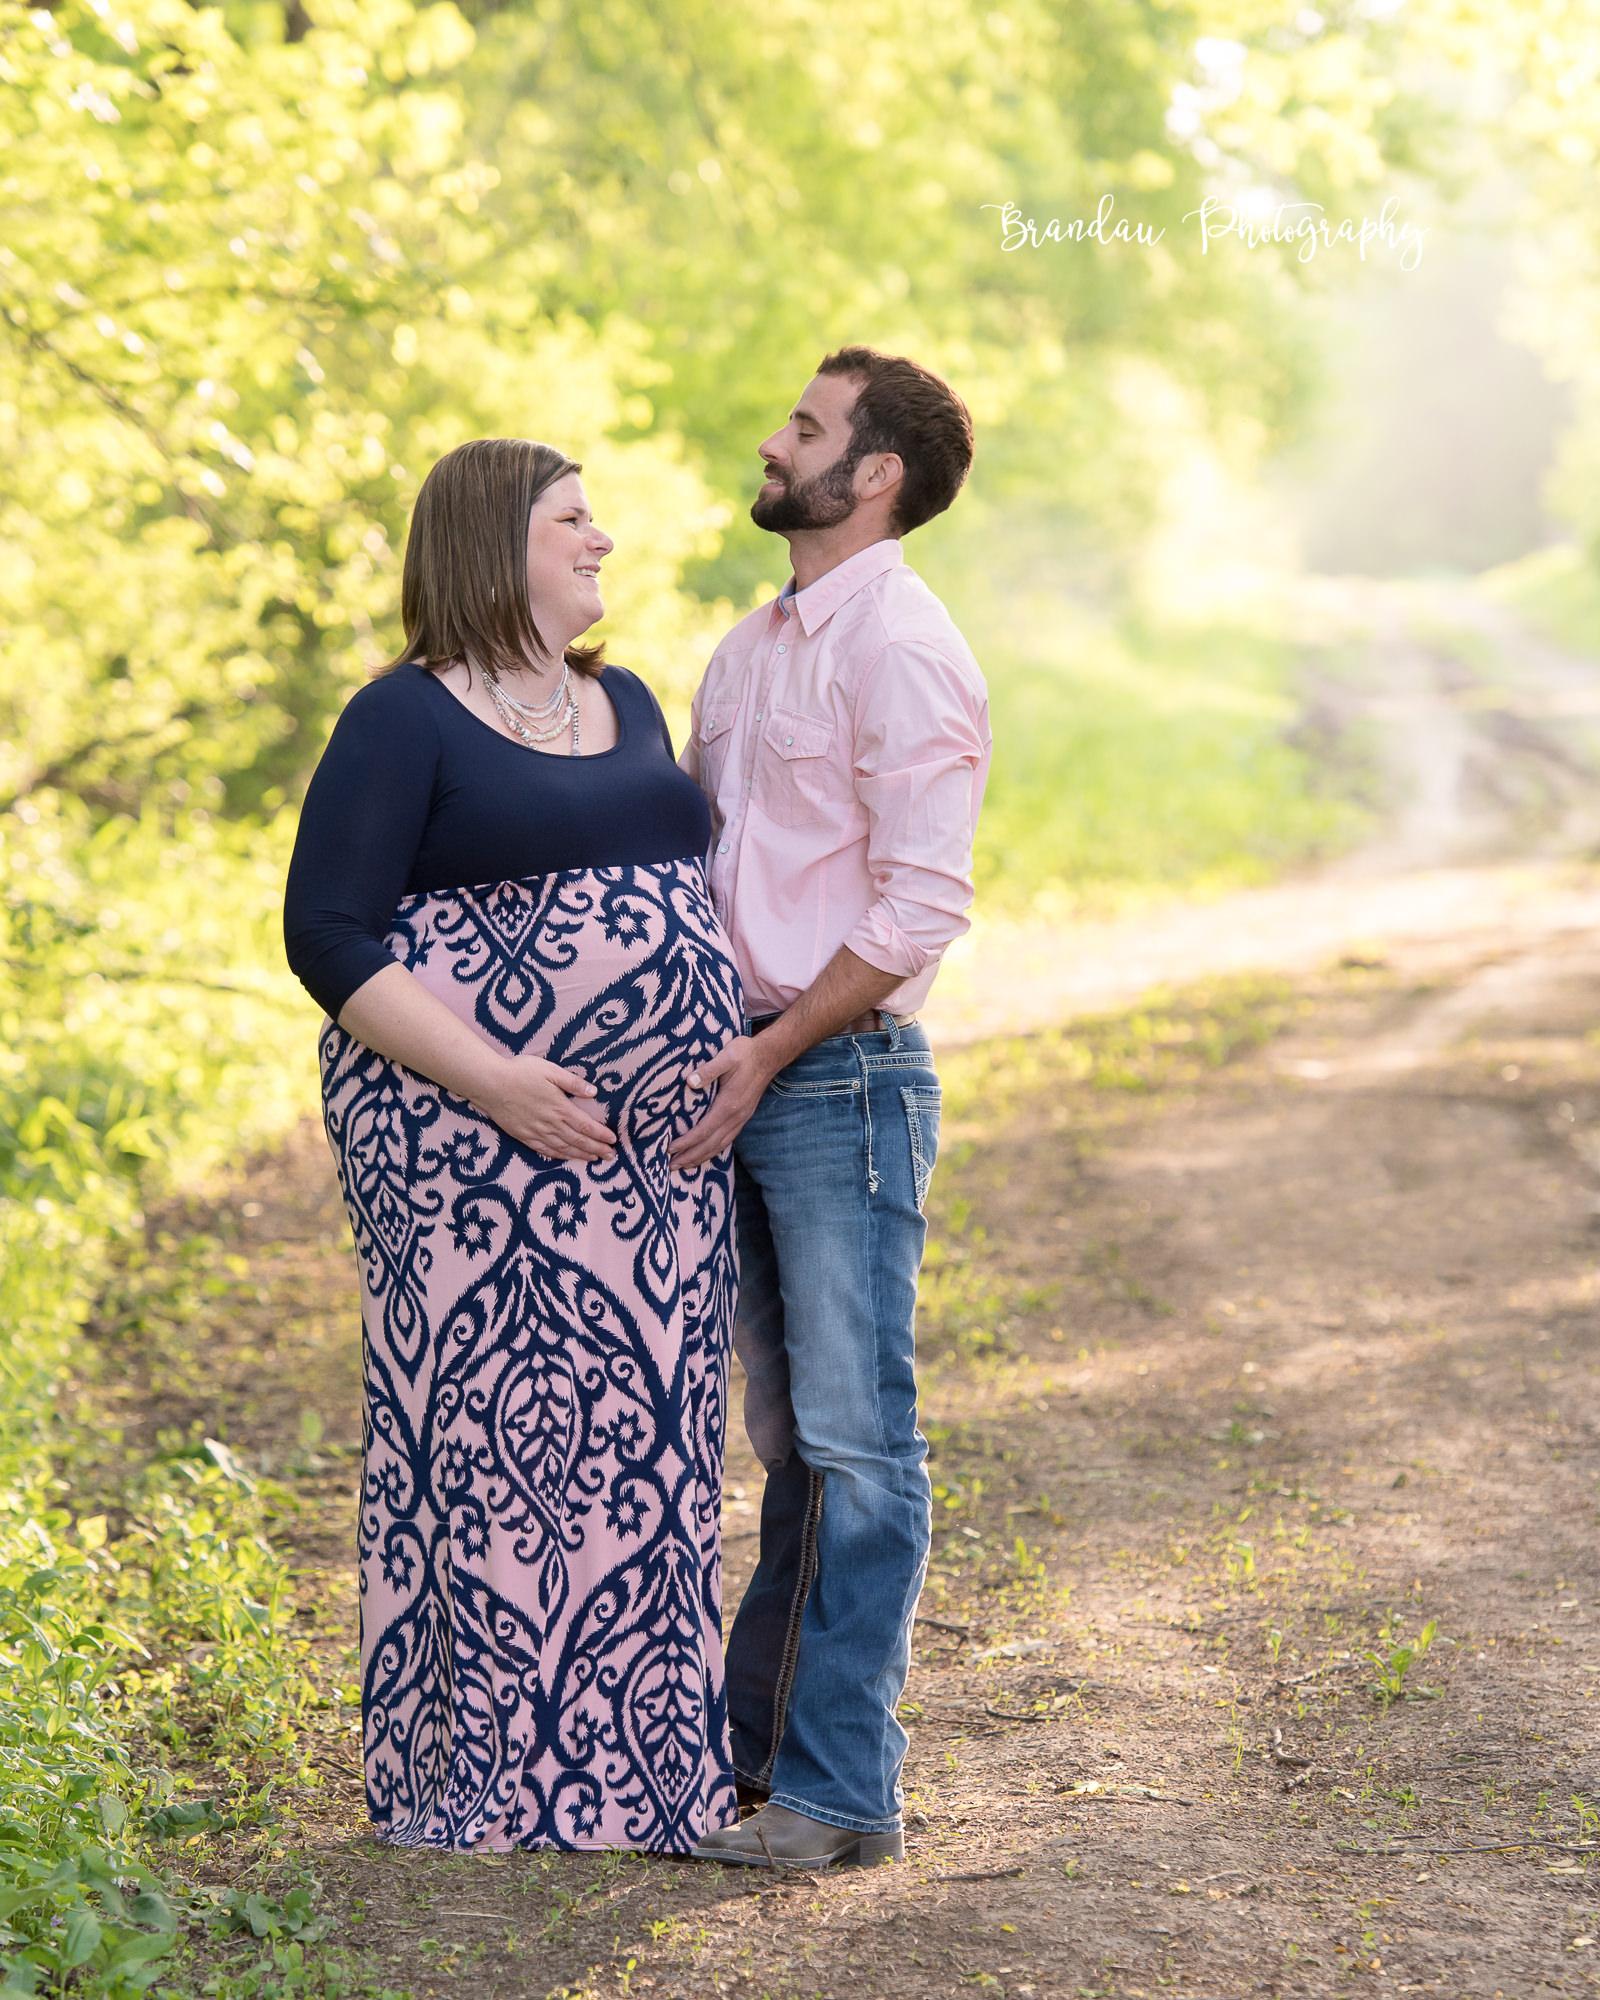 Baby Bump_Couple_Maternity_Brandau Photography-2.jpg